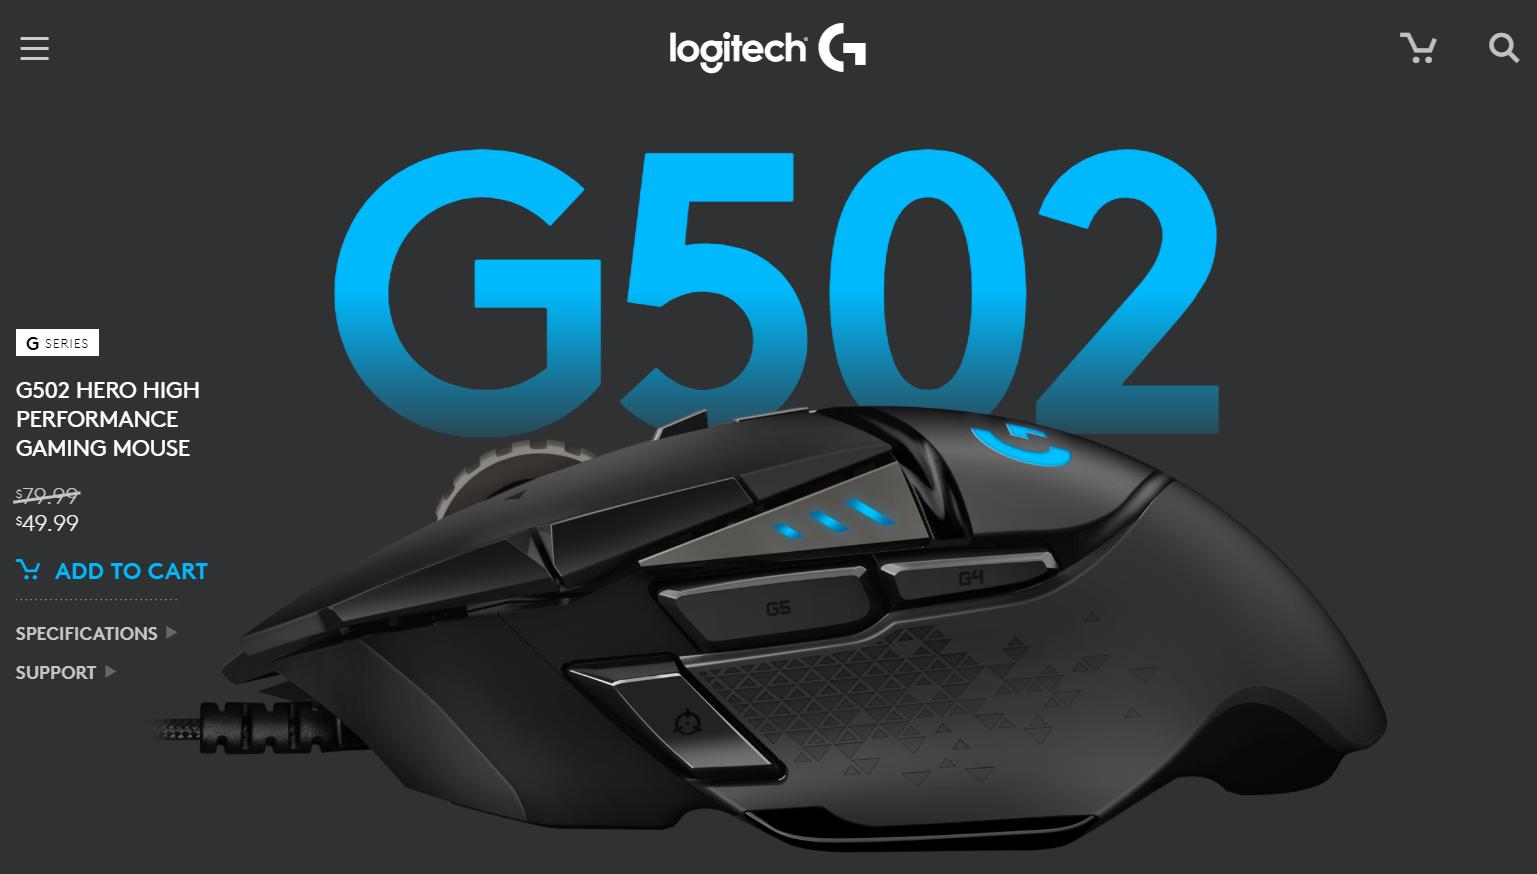 G502 HERO wired $34.99 (AC, YMMV)